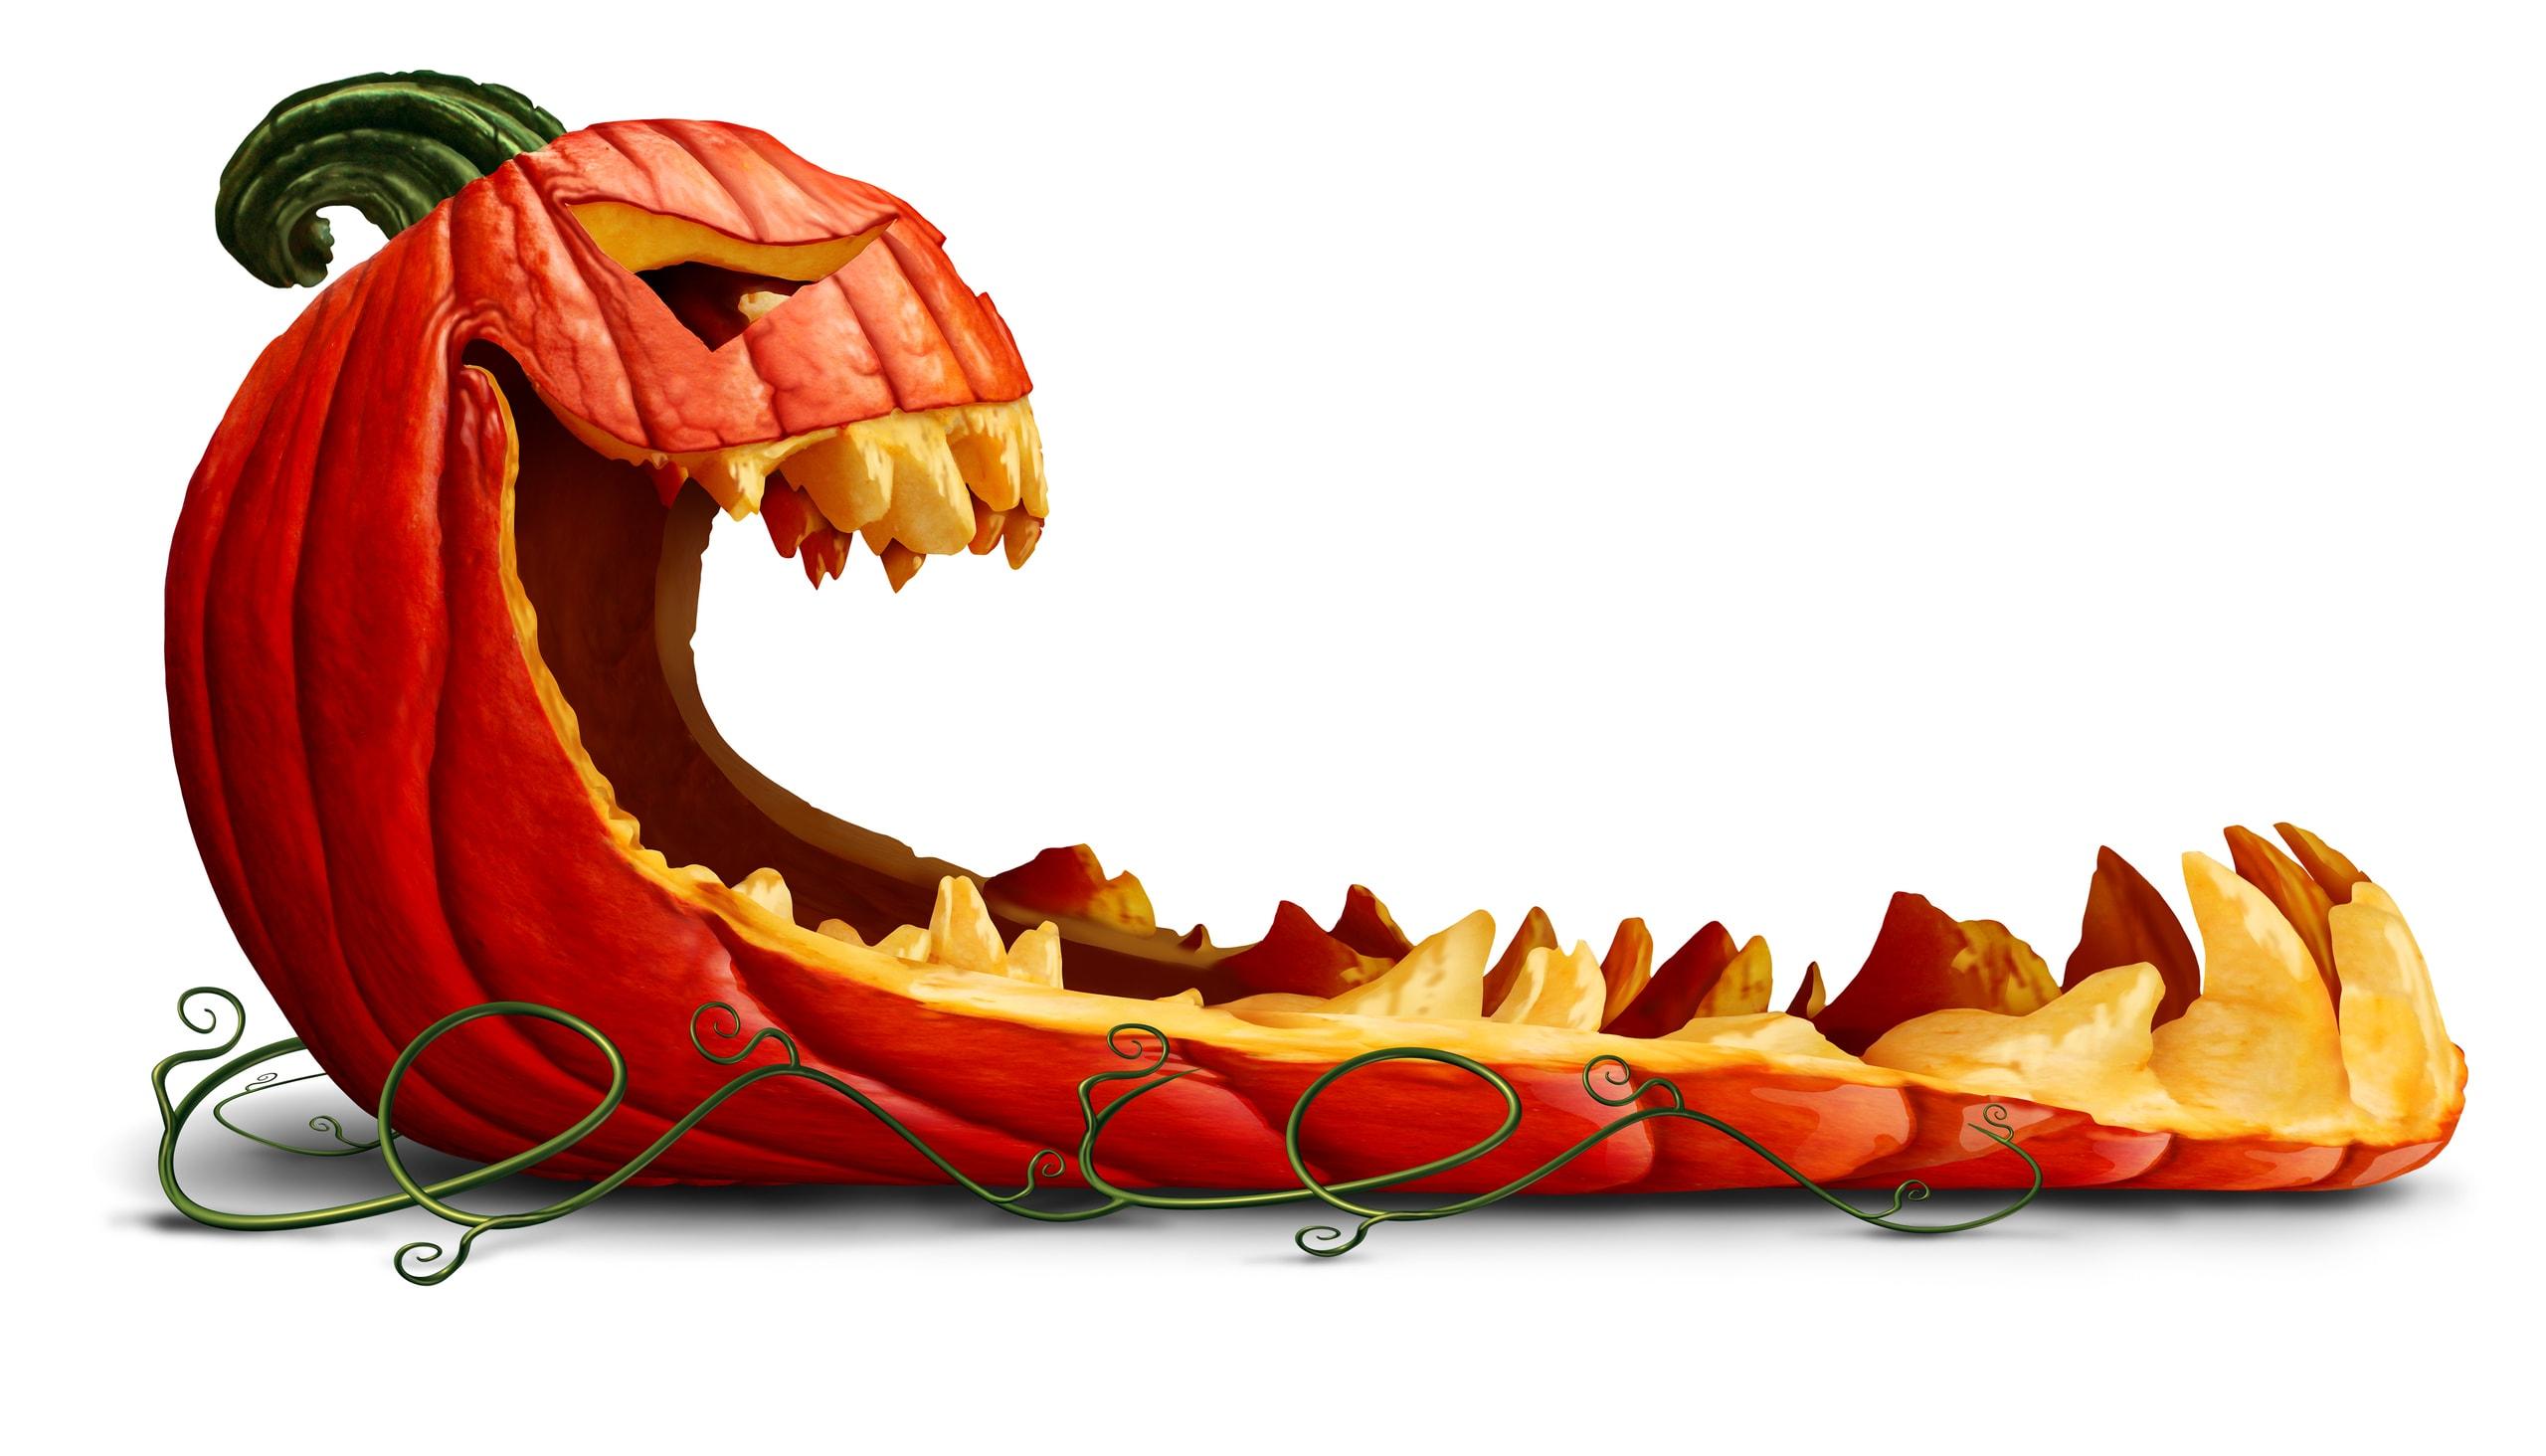 Halloween story contest winners – enjoy!